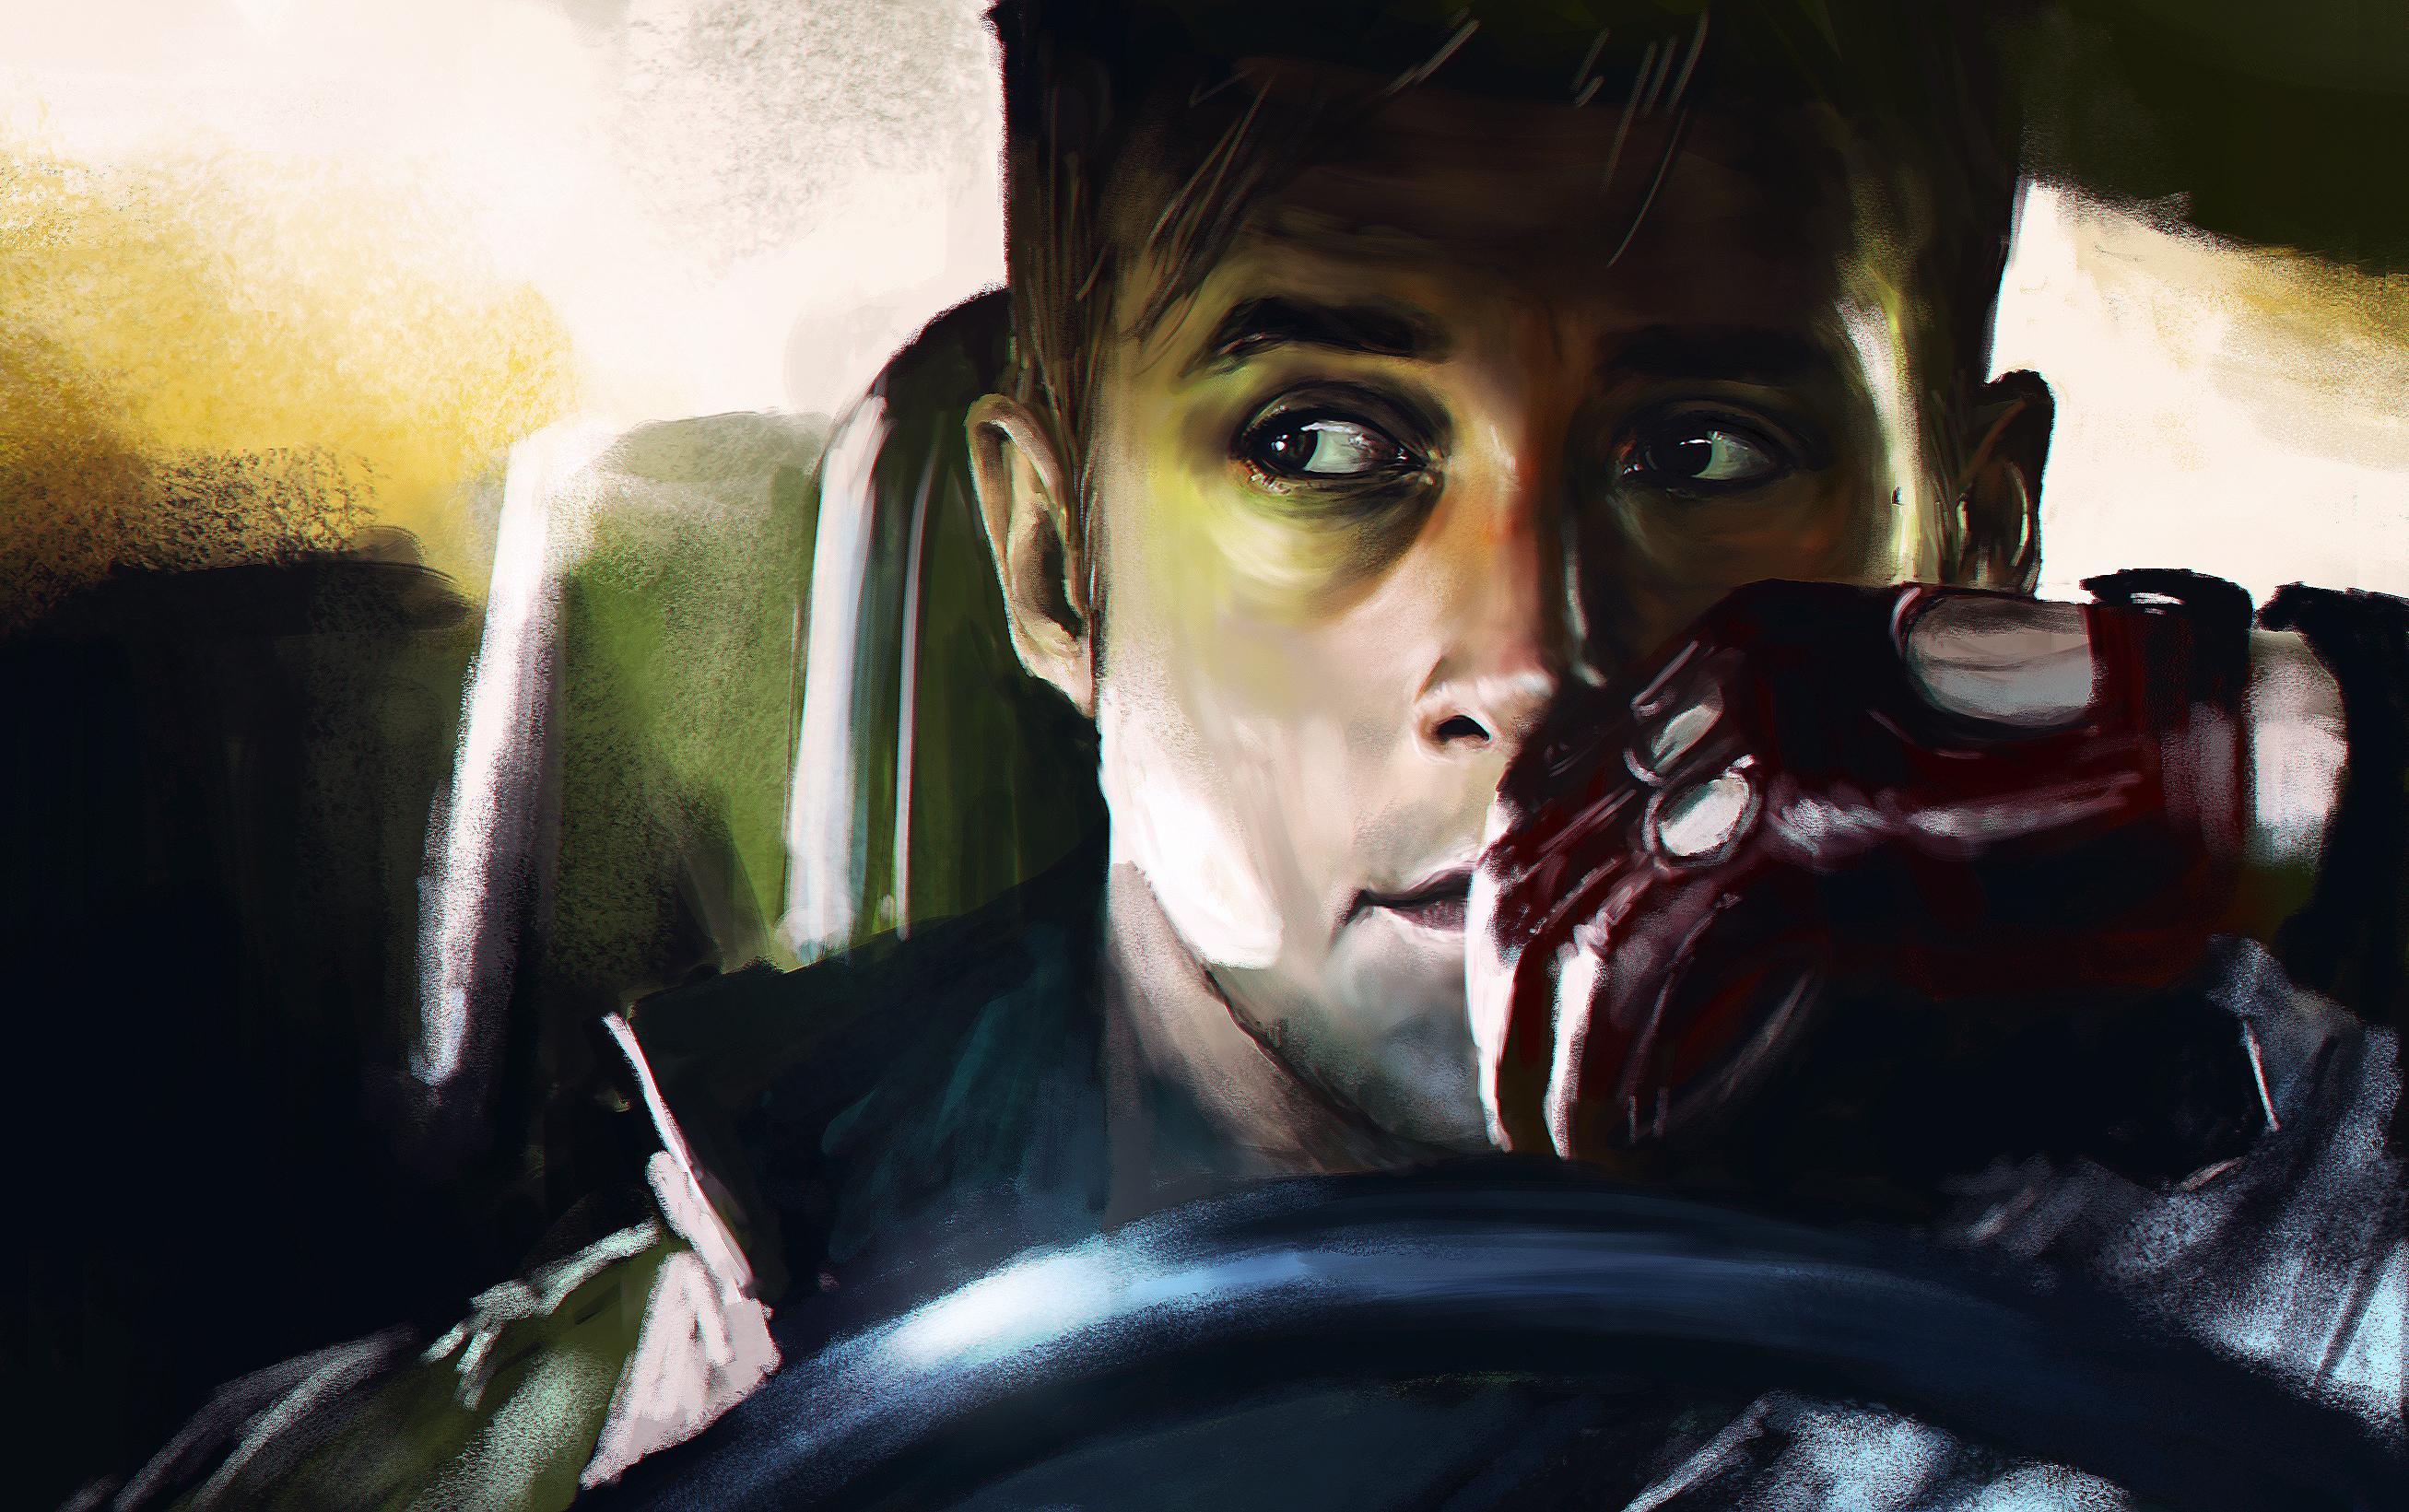 Wallpaper portrait ryan gosling driver drive art film portrait ryan gosling driver drive art film darkness fiction voltagebd Images